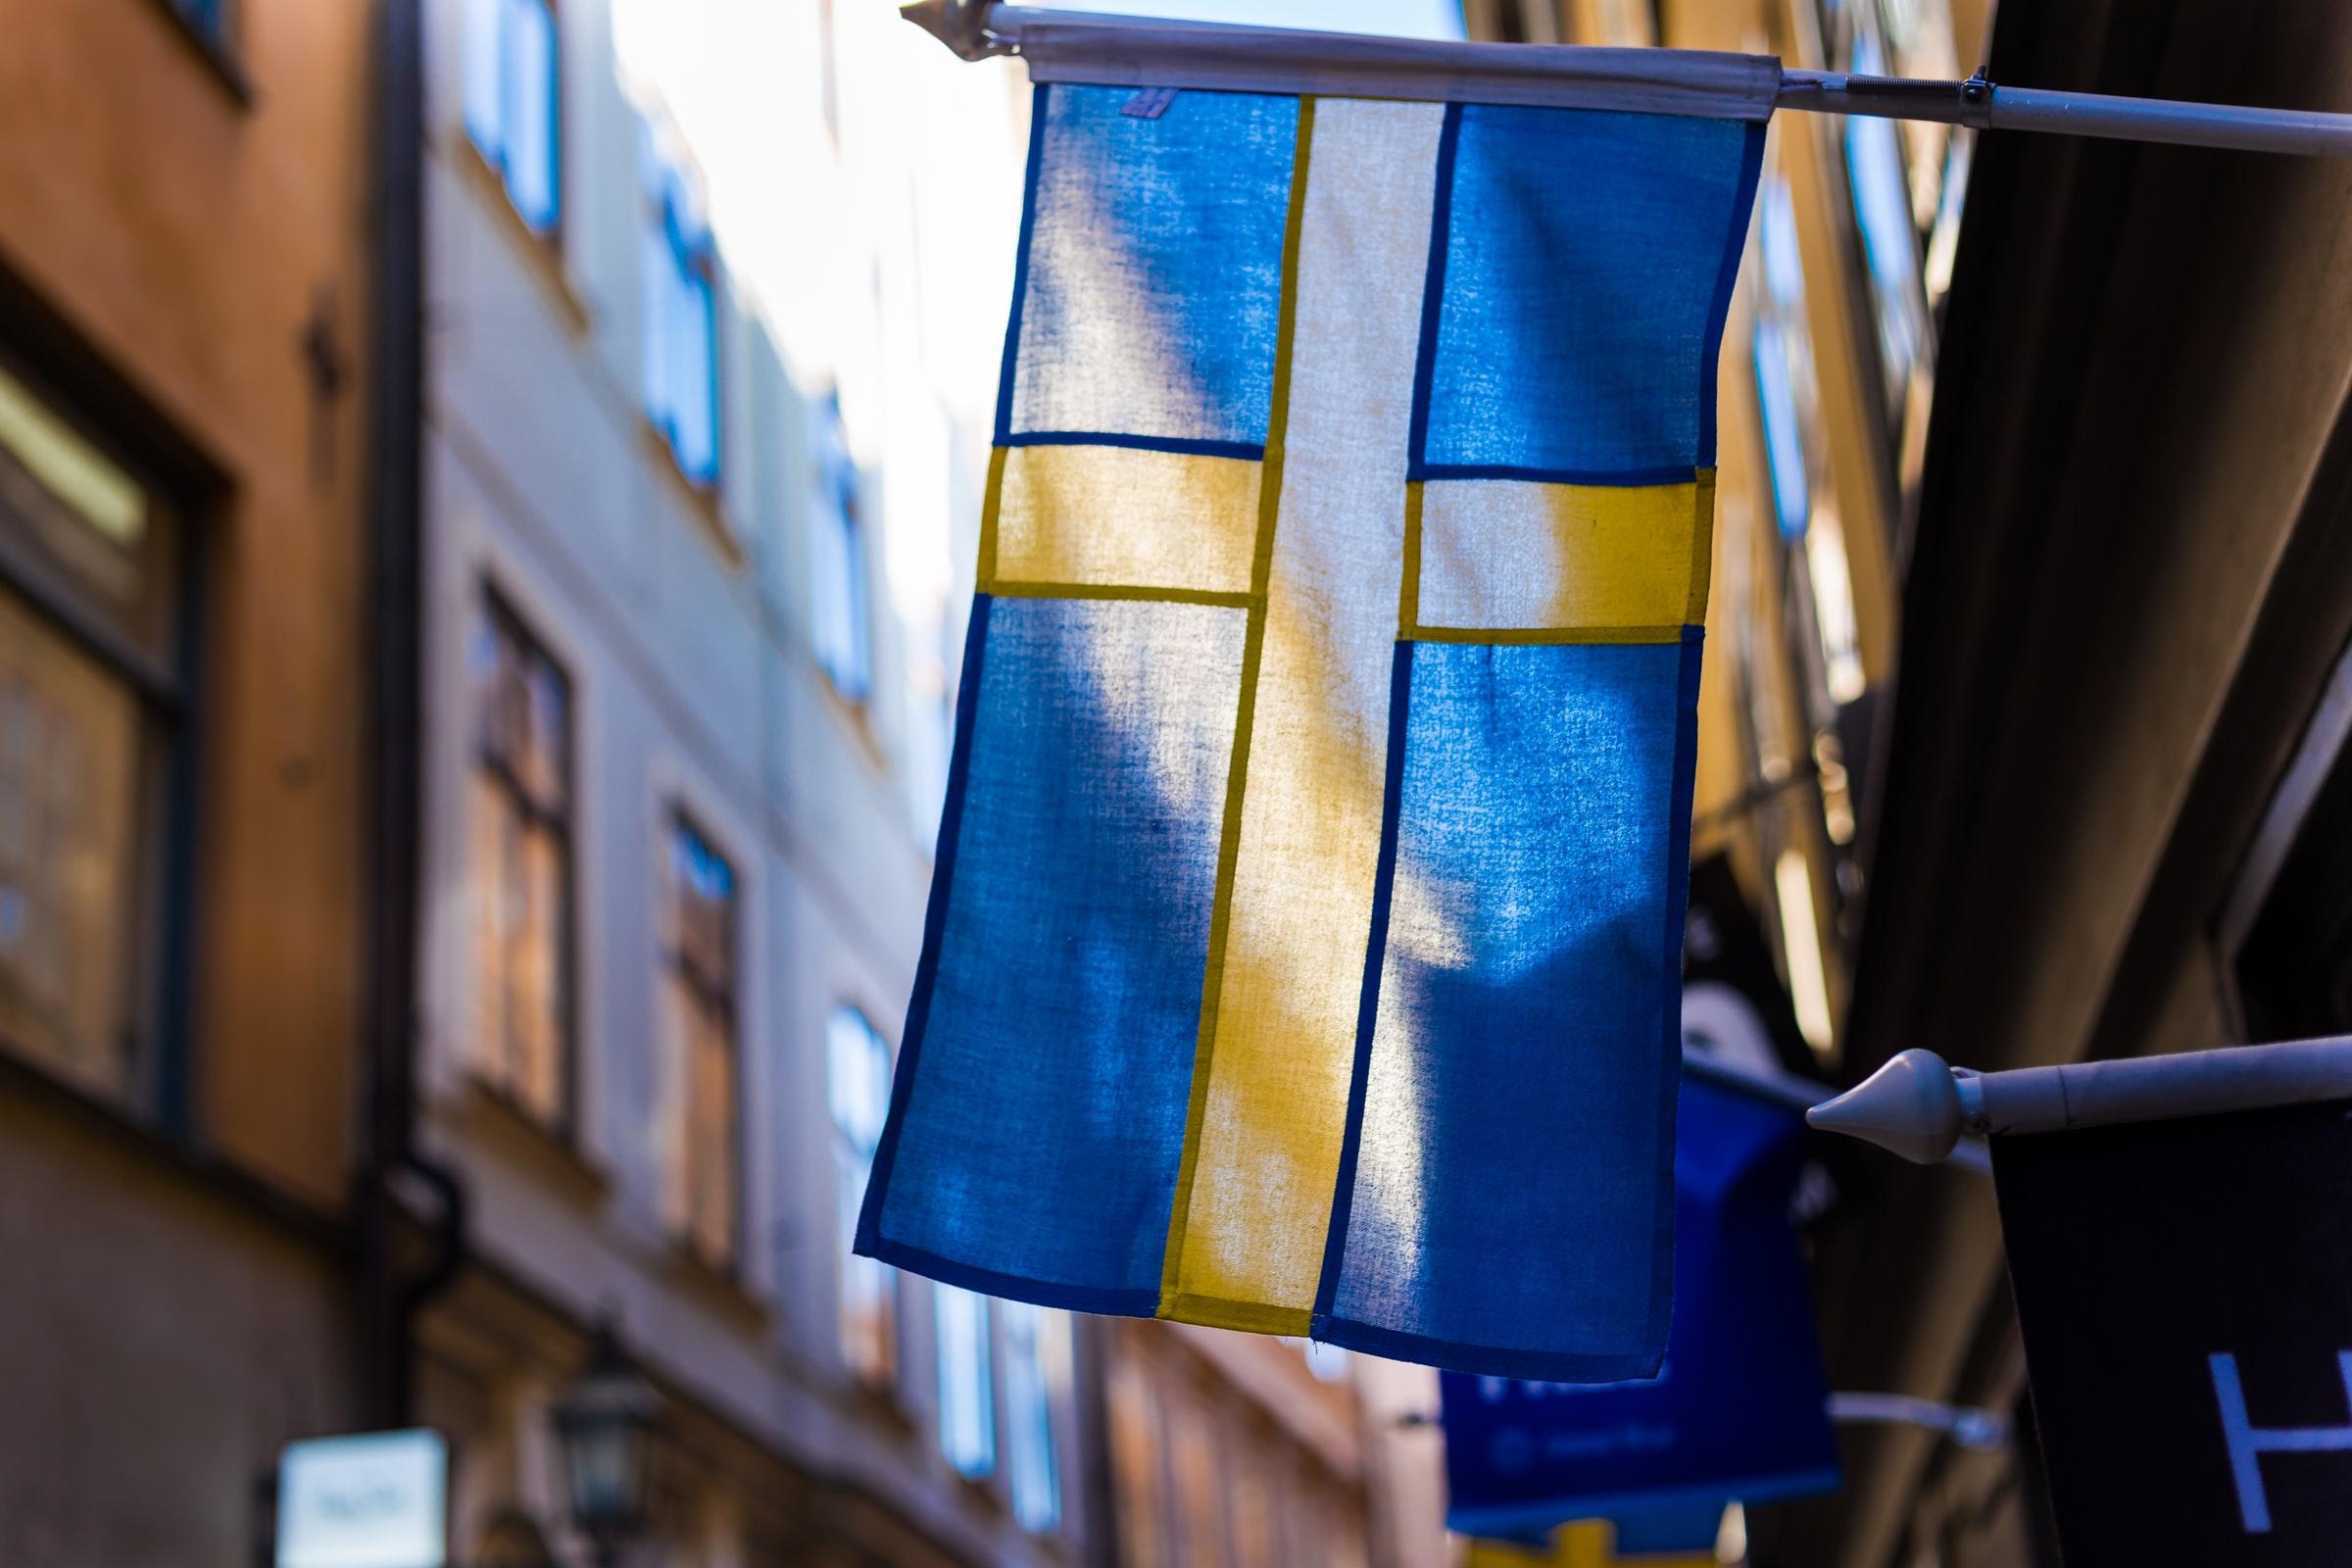 The Swedish Values